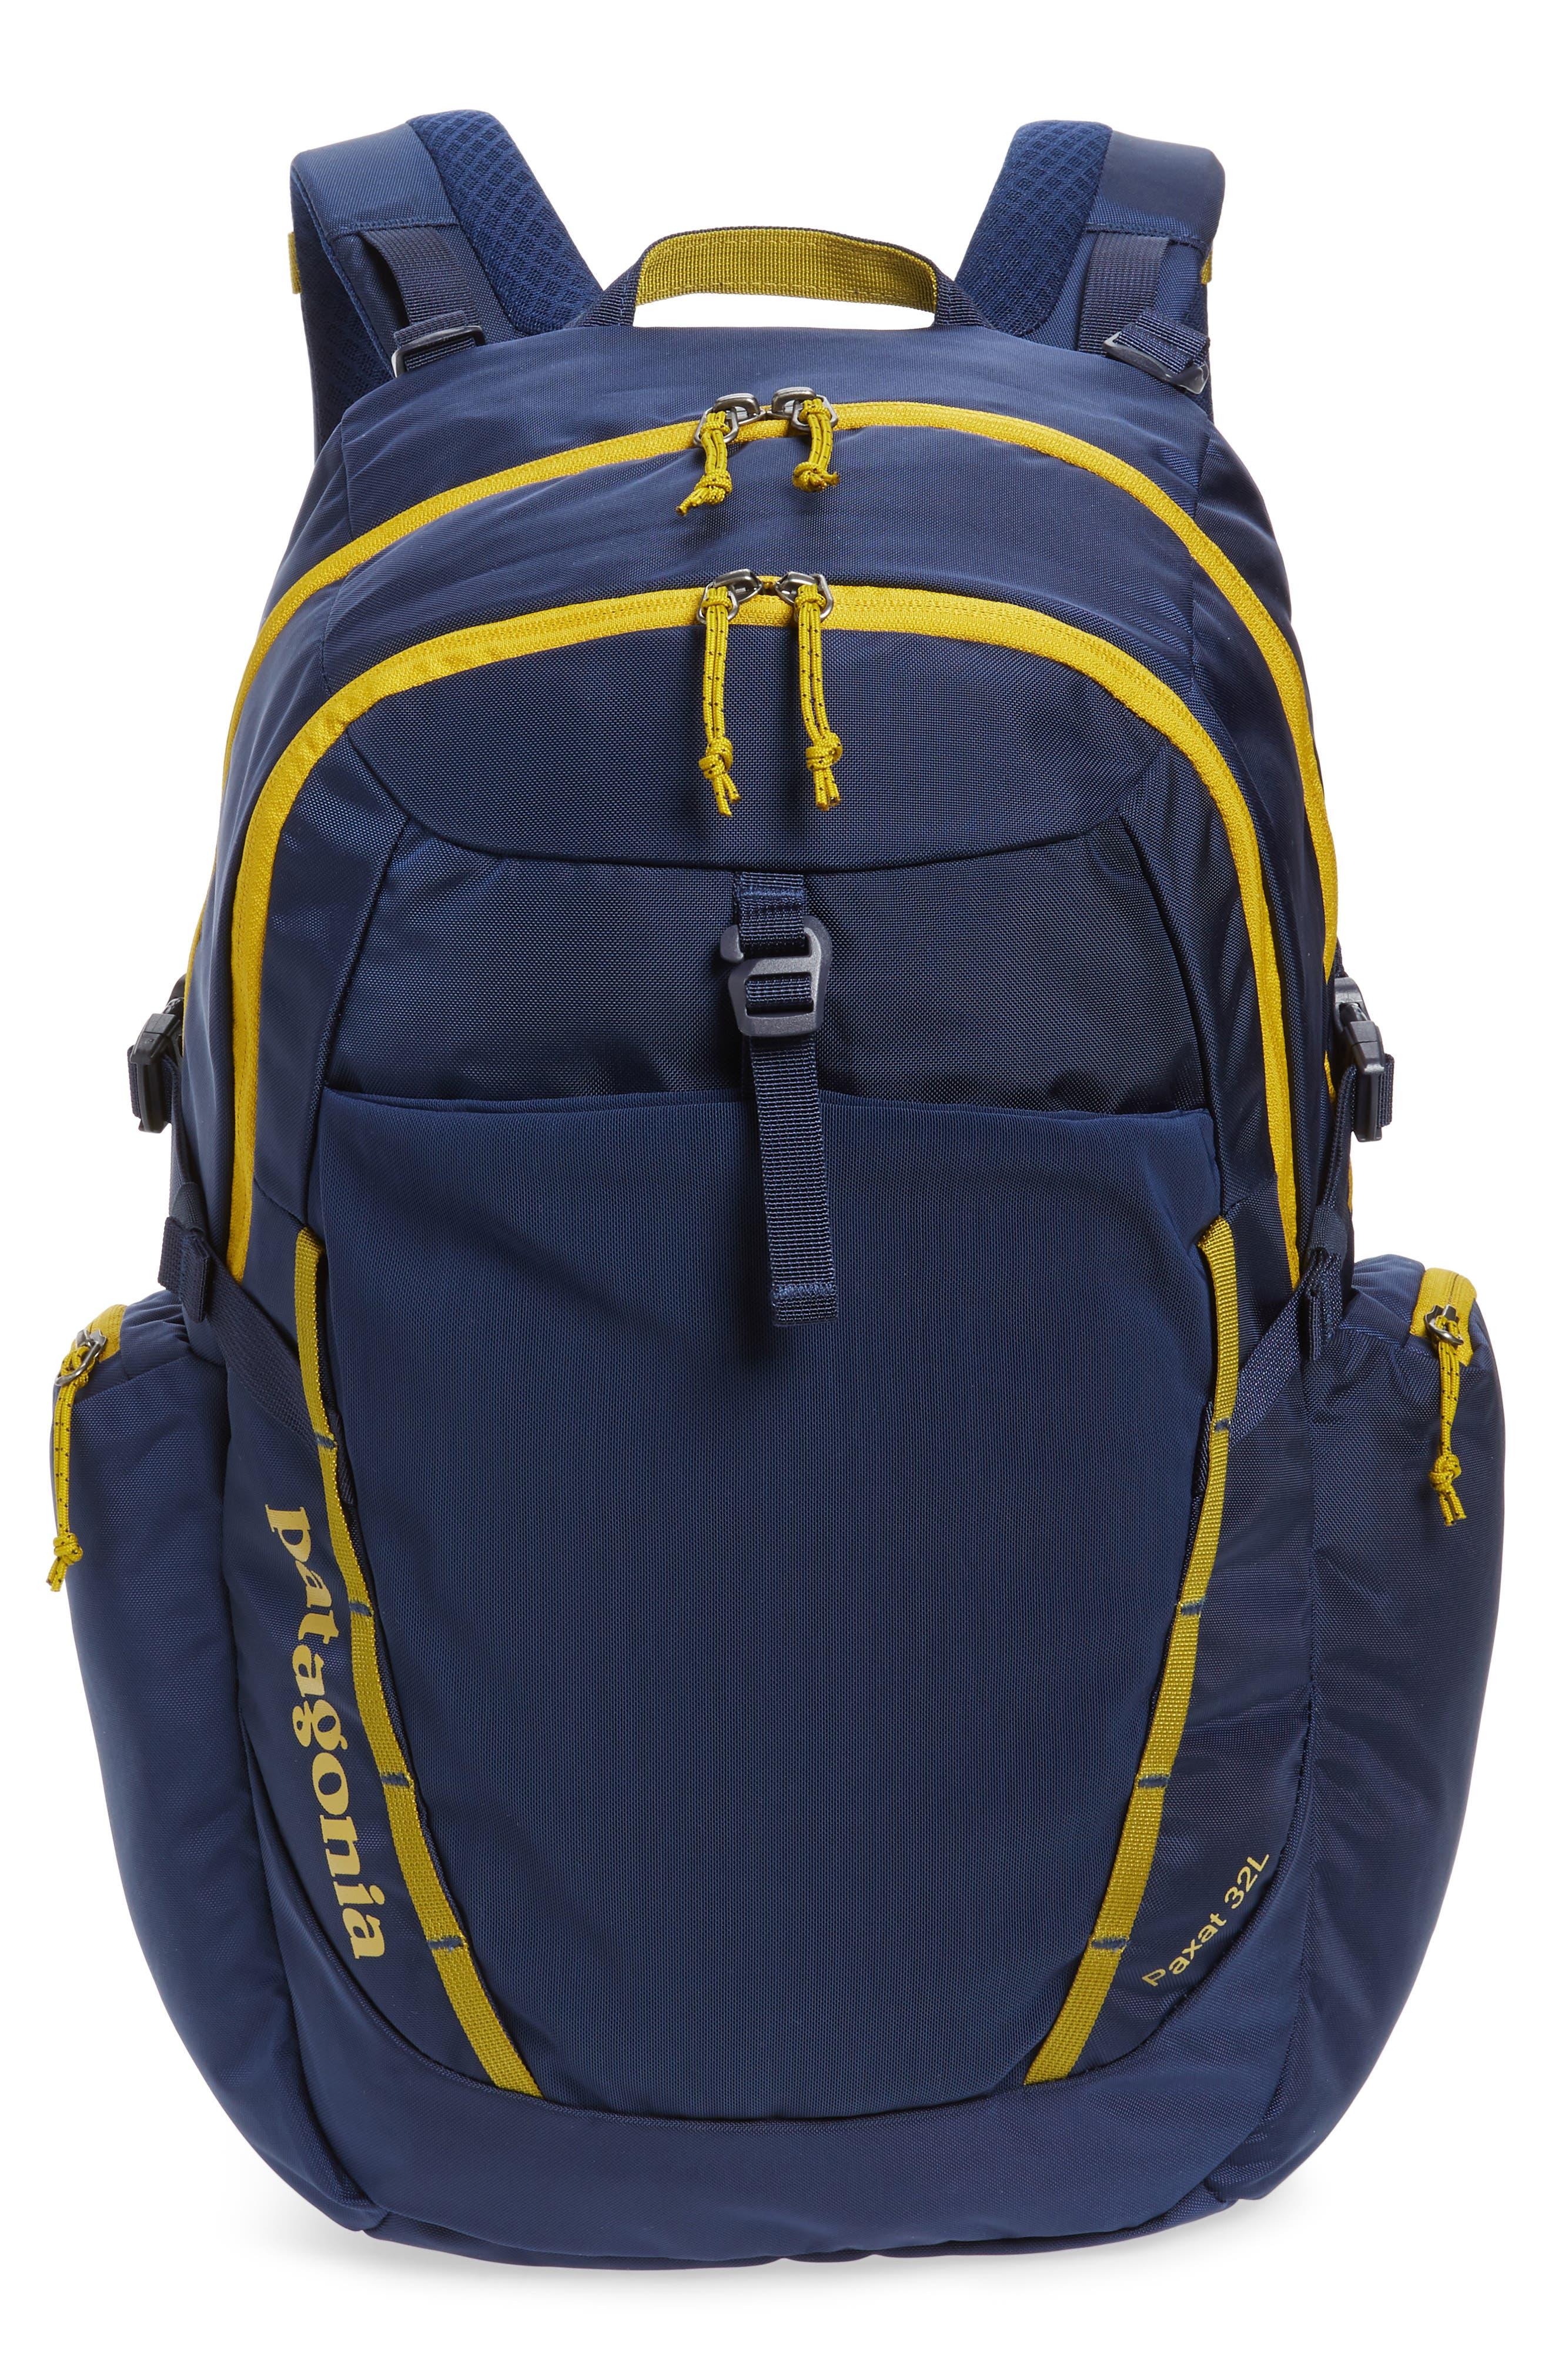 Paxat 32-Liter Backpack,                             Main thumbnail 1, color,                             CLASSIC NAVY